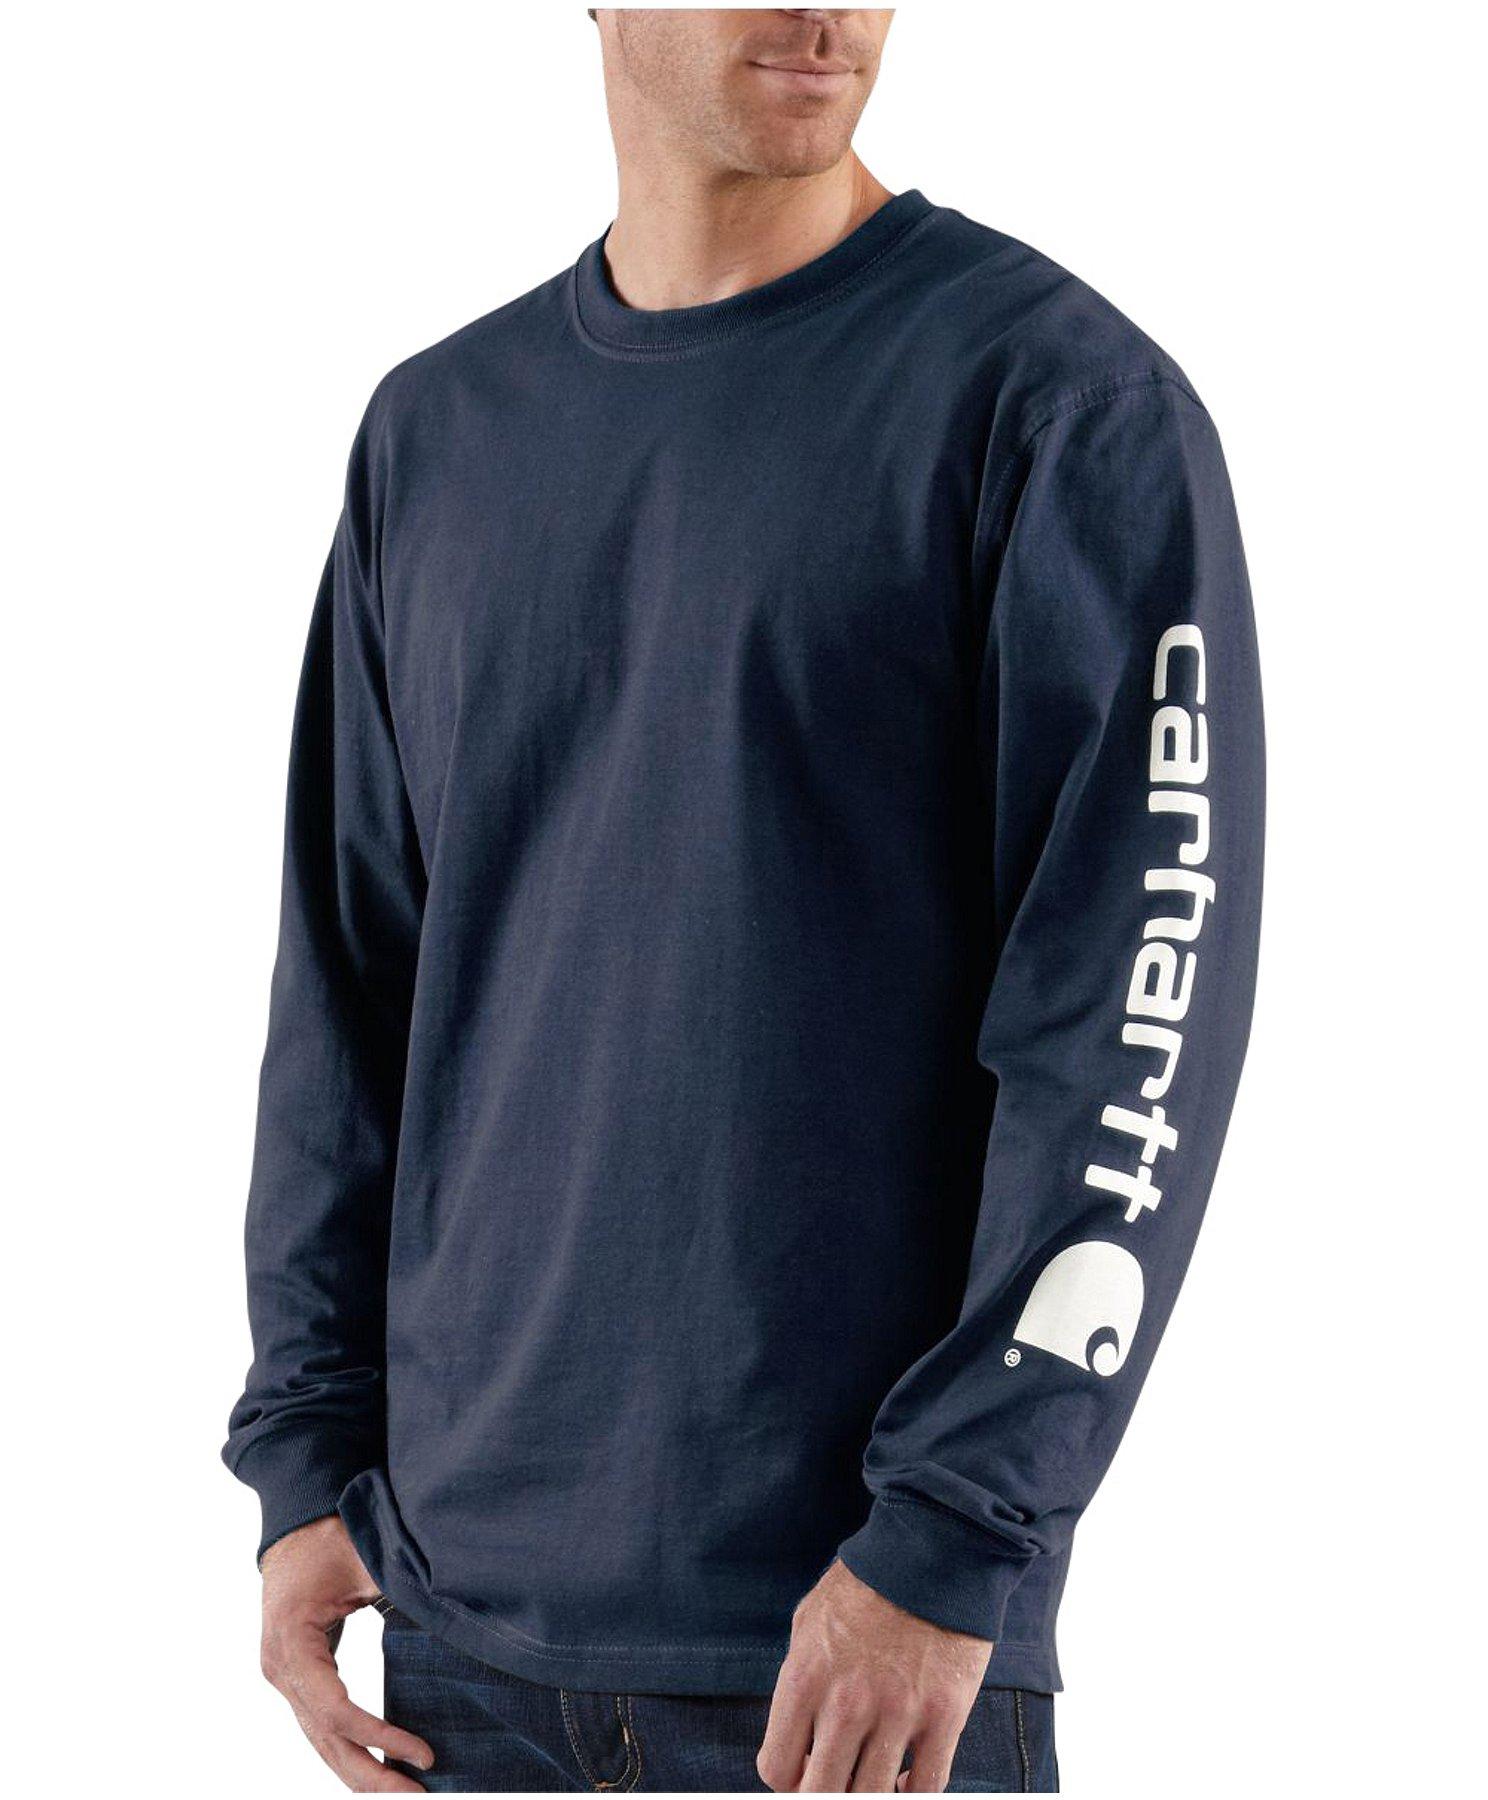 footwear cheapest sale retailer Men's Long-Sleeve Graphic T-Shirt